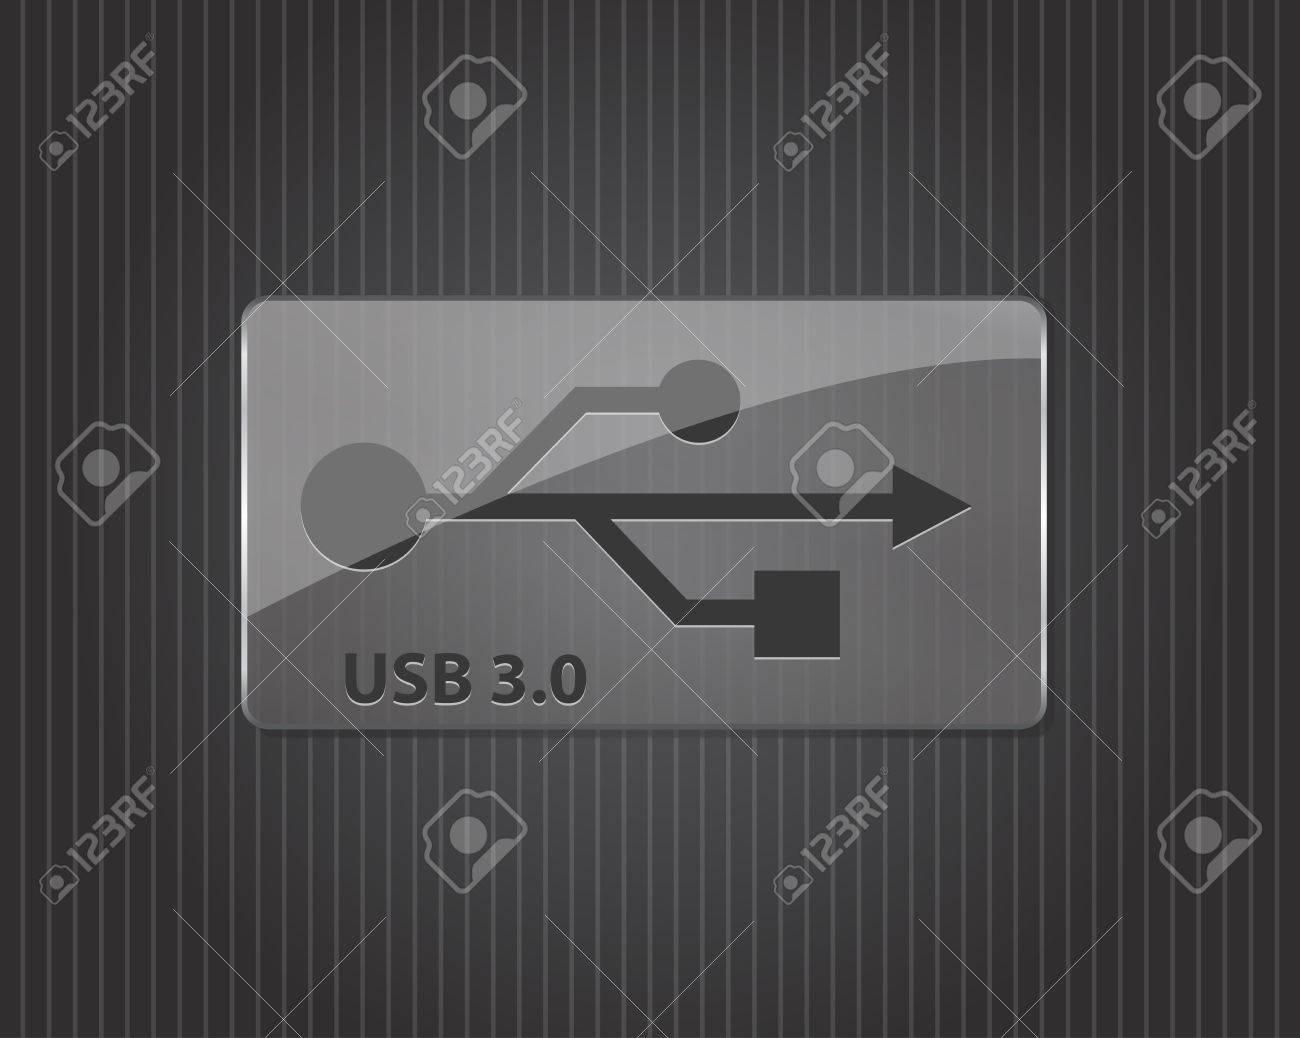 USB 3.0 glass sign- illustration Stock Vector - 16319836